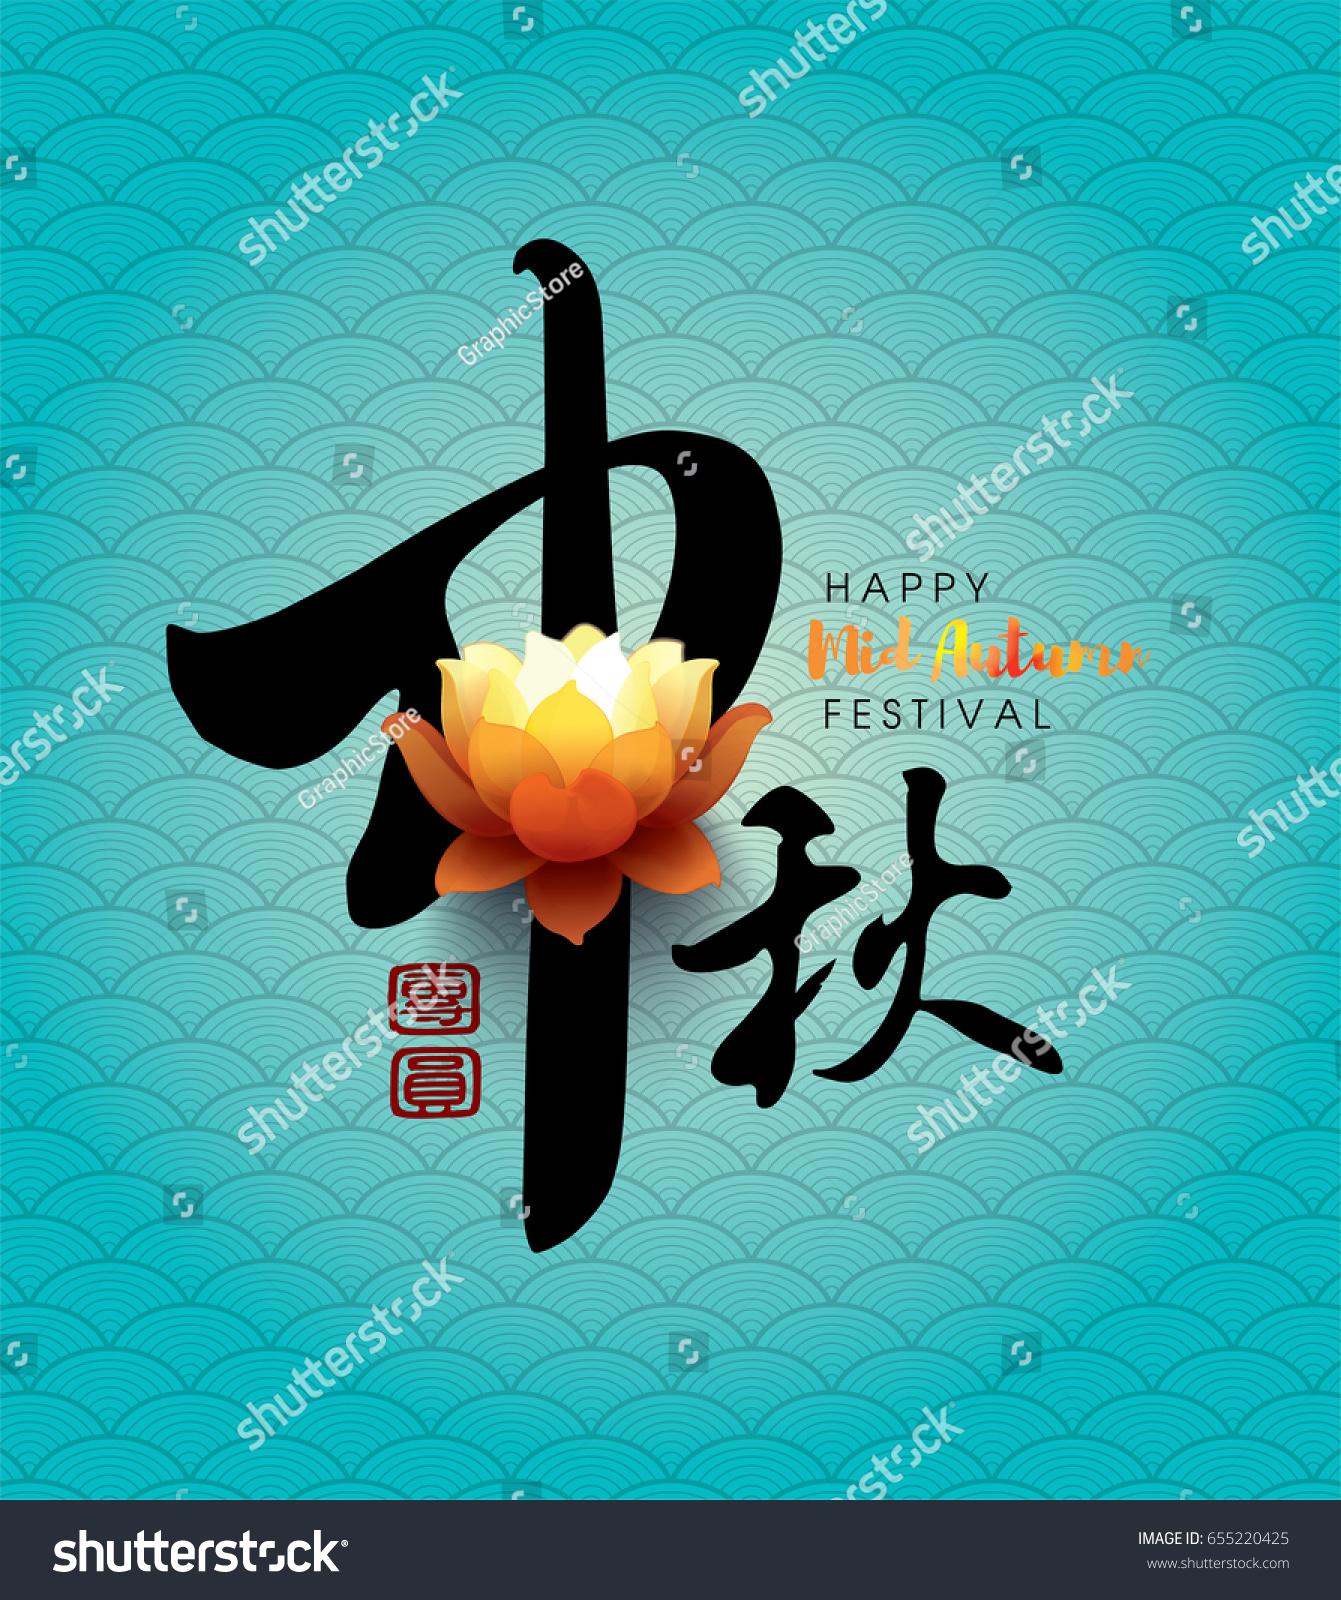 Chinese mid autumn festival design lotus stock vector 655220425 chinese mid autumn festival design lotus chinese calligraphy translation mid autumn festival small kristyandbryce Choice Image